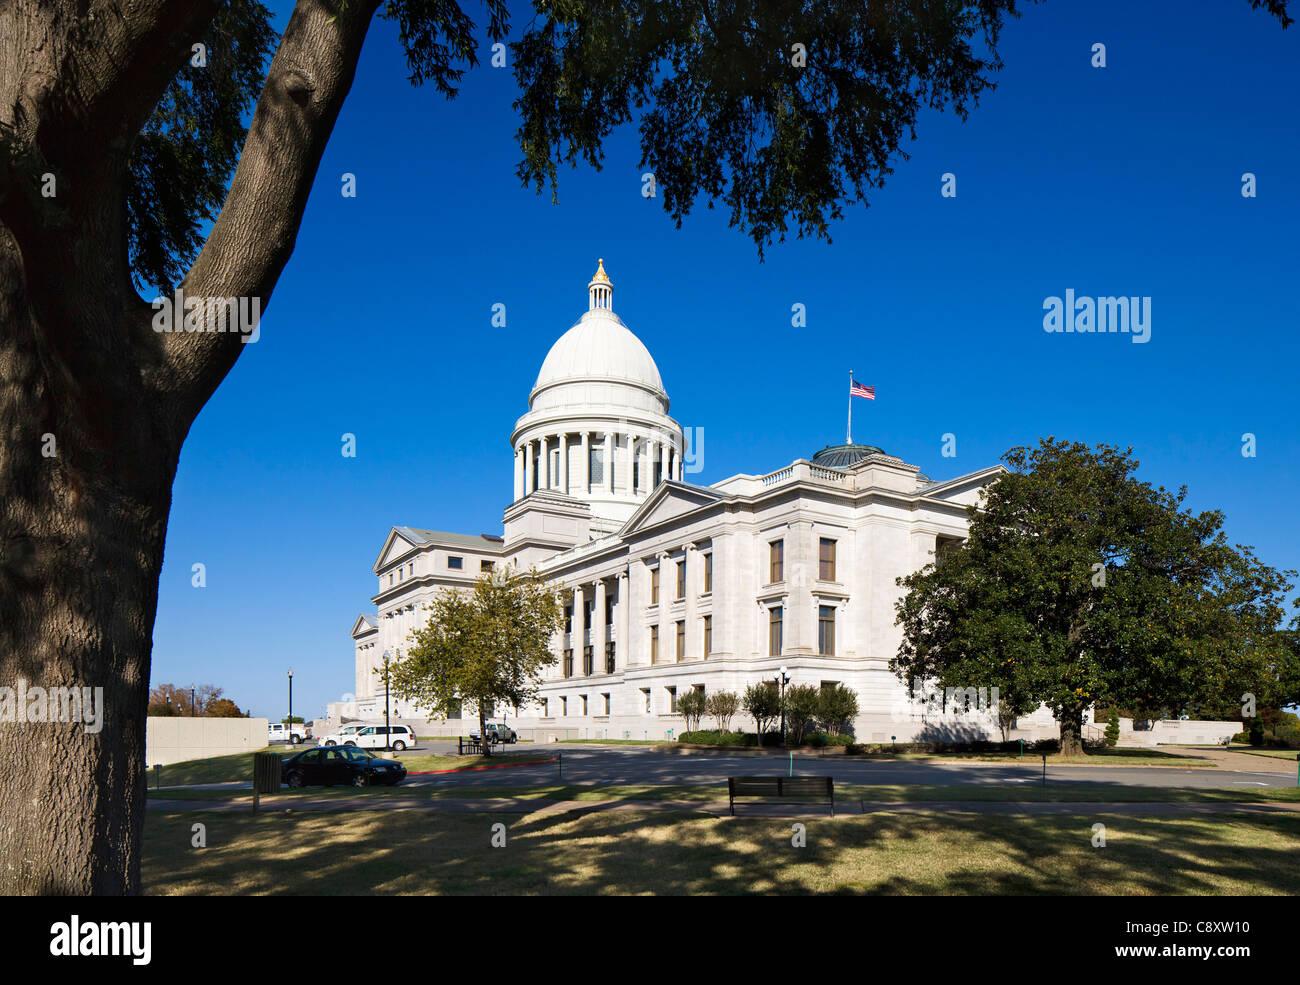 Arkansas state capitol dome stock photos arkansas state capitol the arkansas state capitol building little rock arkansas usa stock image malvernweather Gallery